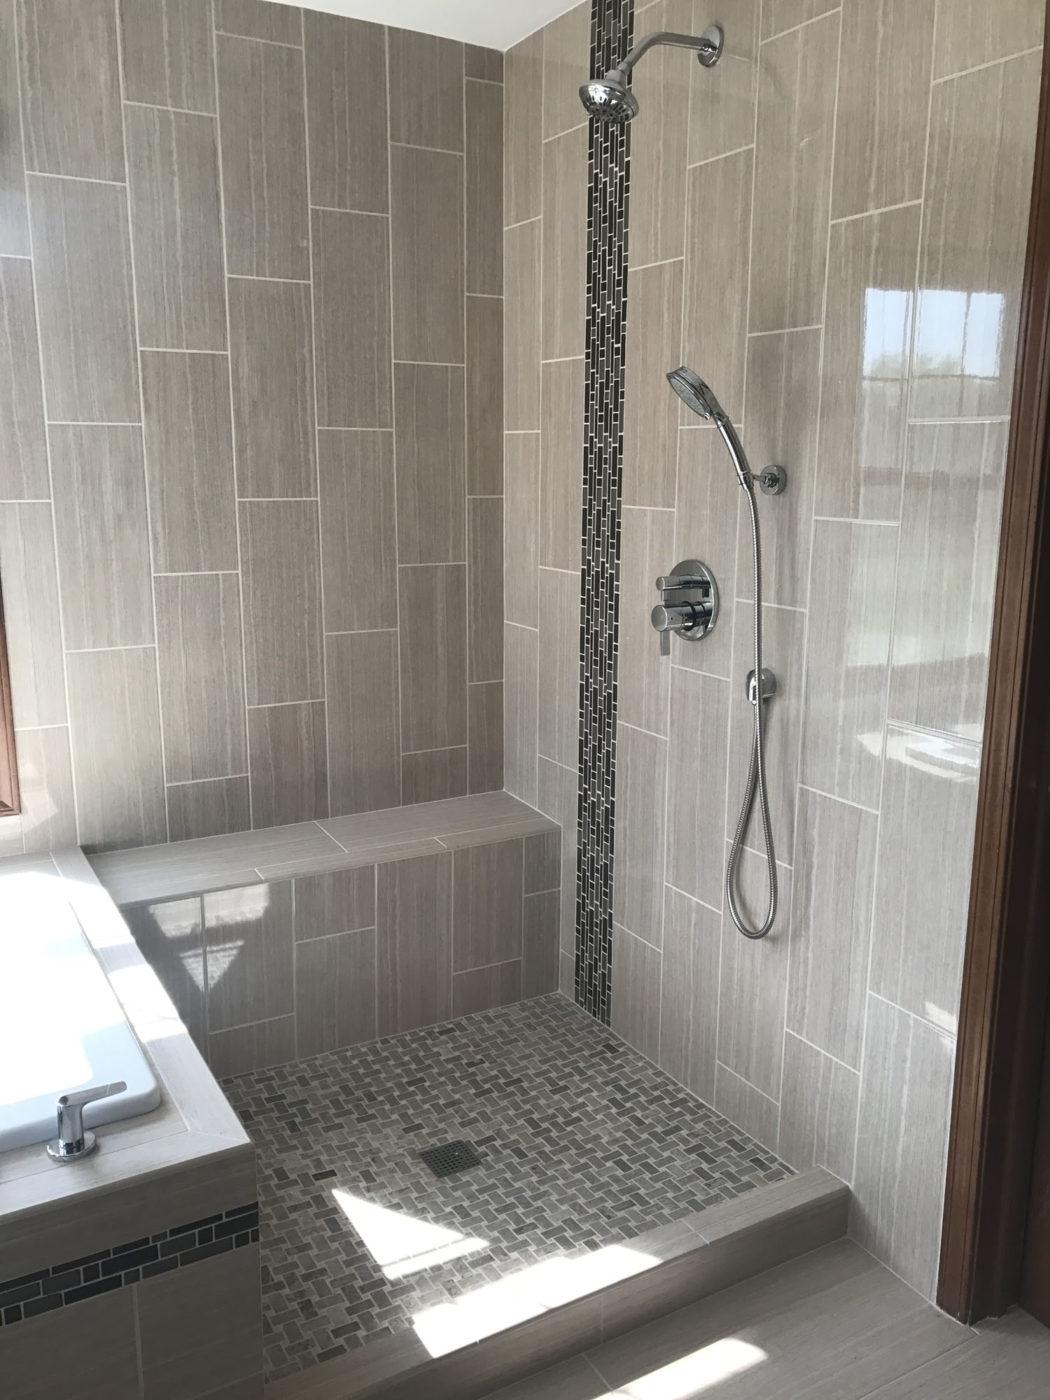 Master Bathroom Remodeling Schaumburg - new shower